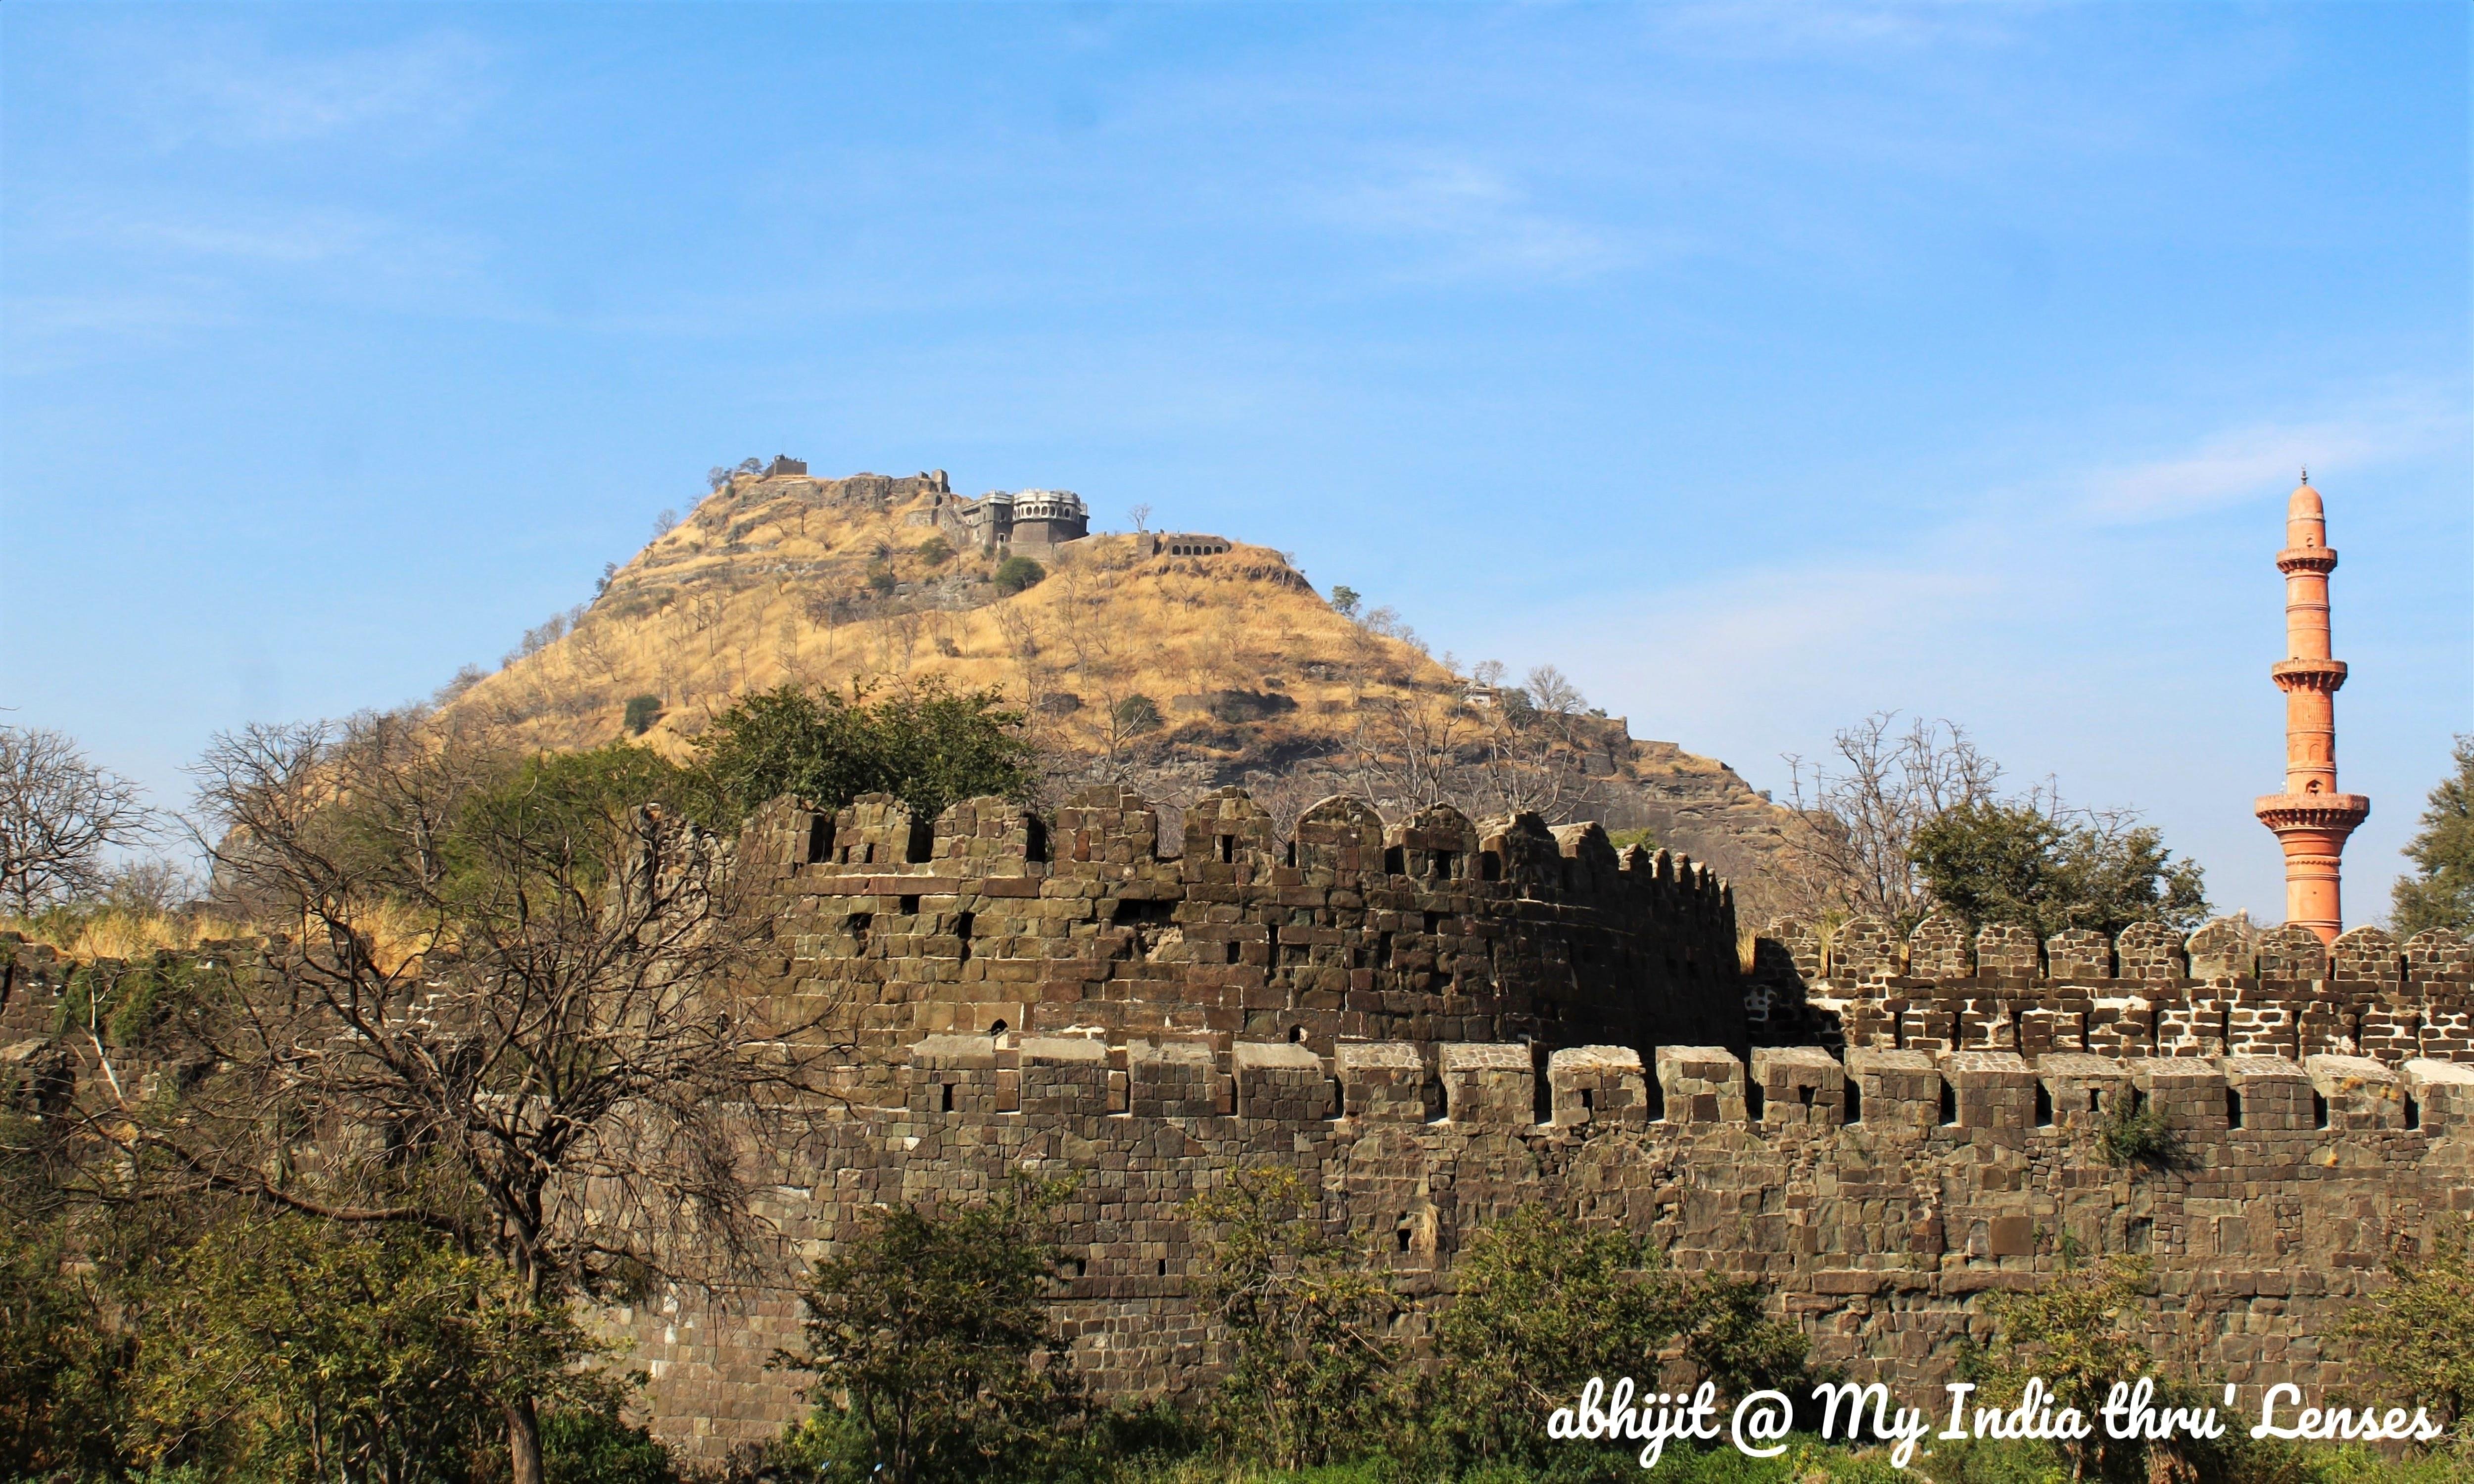 The Daulatabad Fort